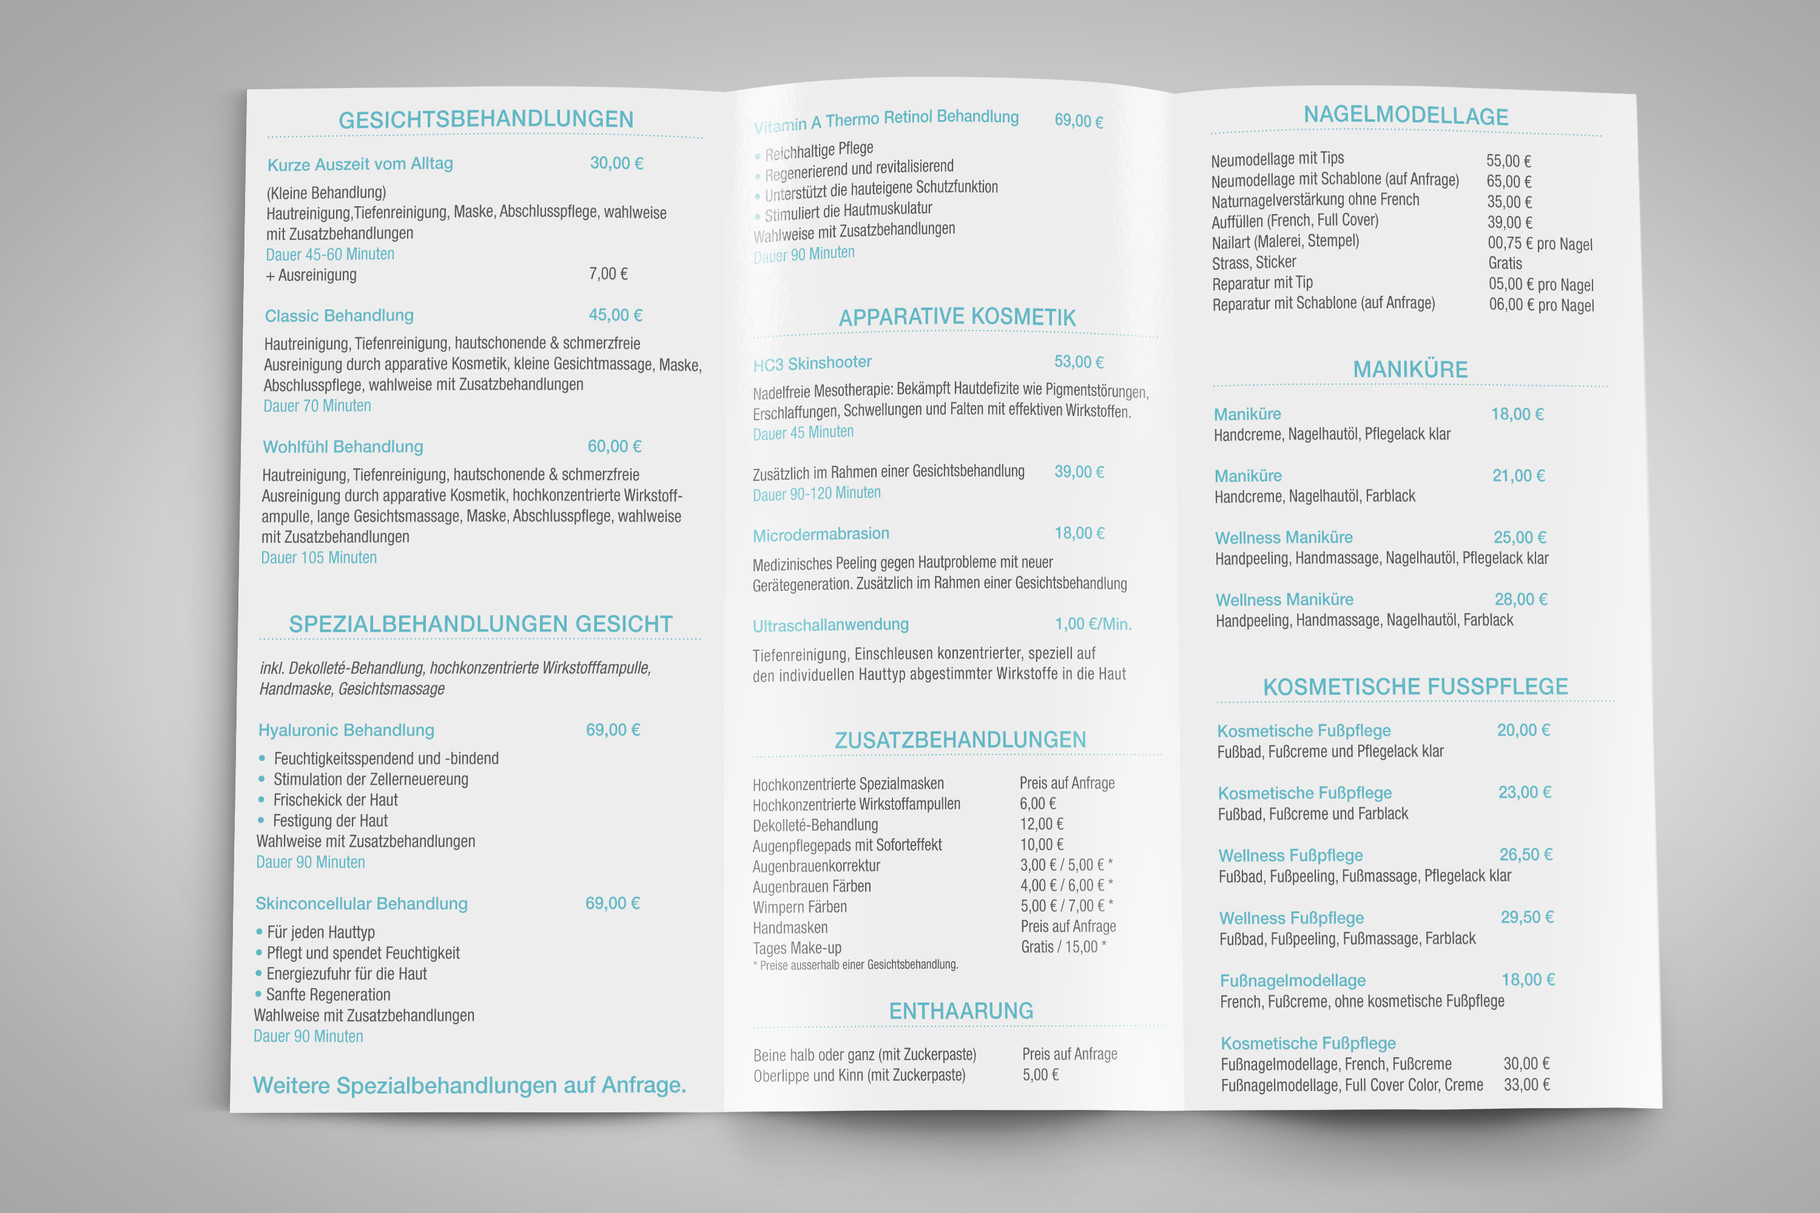 Corporate Design, Logoentwicklung, Logo, Grafikdesign, Grafik, Gestaltung, Beautyloft Preisliste